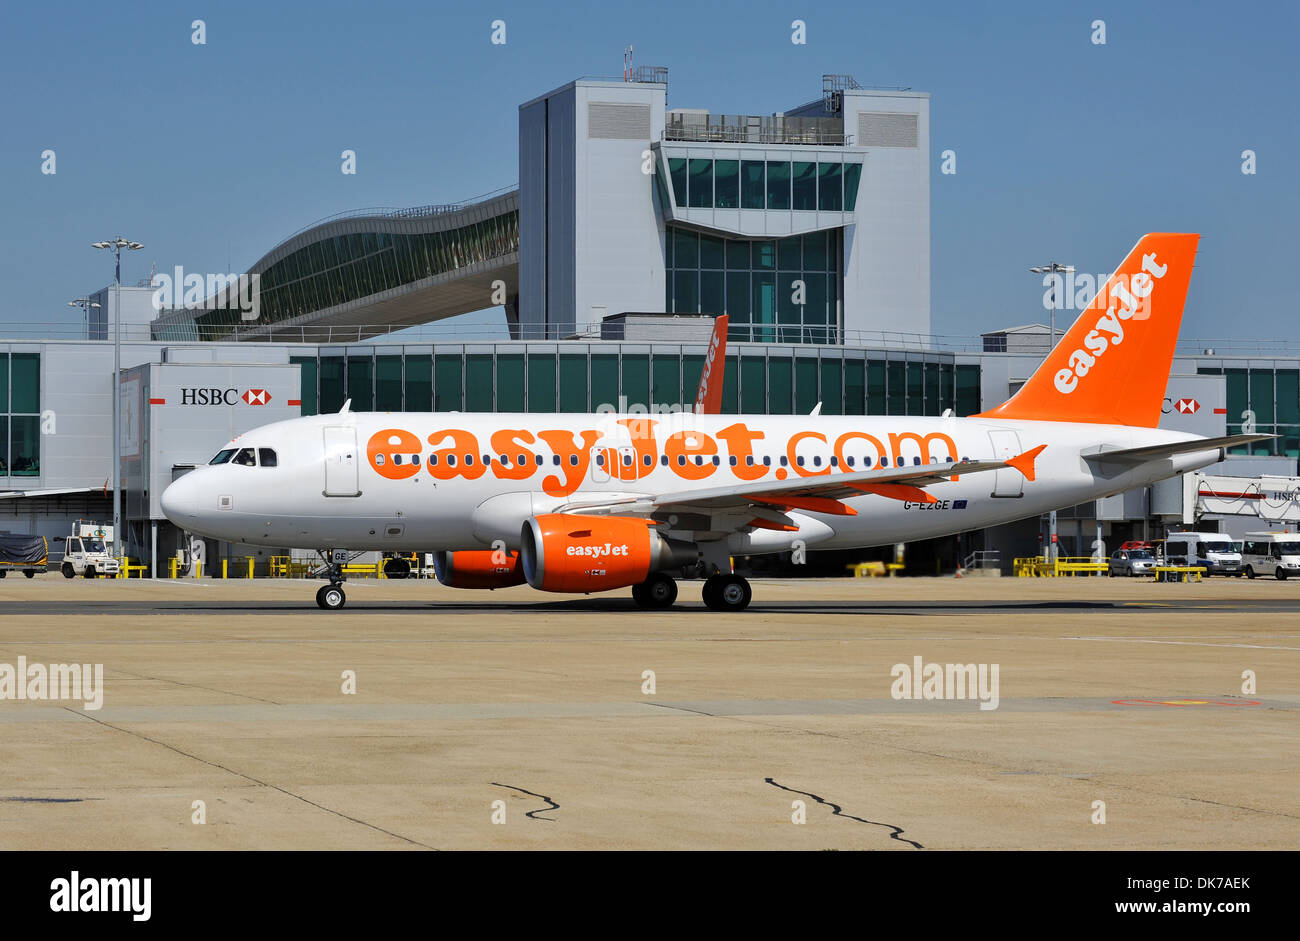 EasyJet plane, EasyJet airline, EasyJet aeroplane at Gatwick Airport Terminal, London, Britain, UK - Stock Image